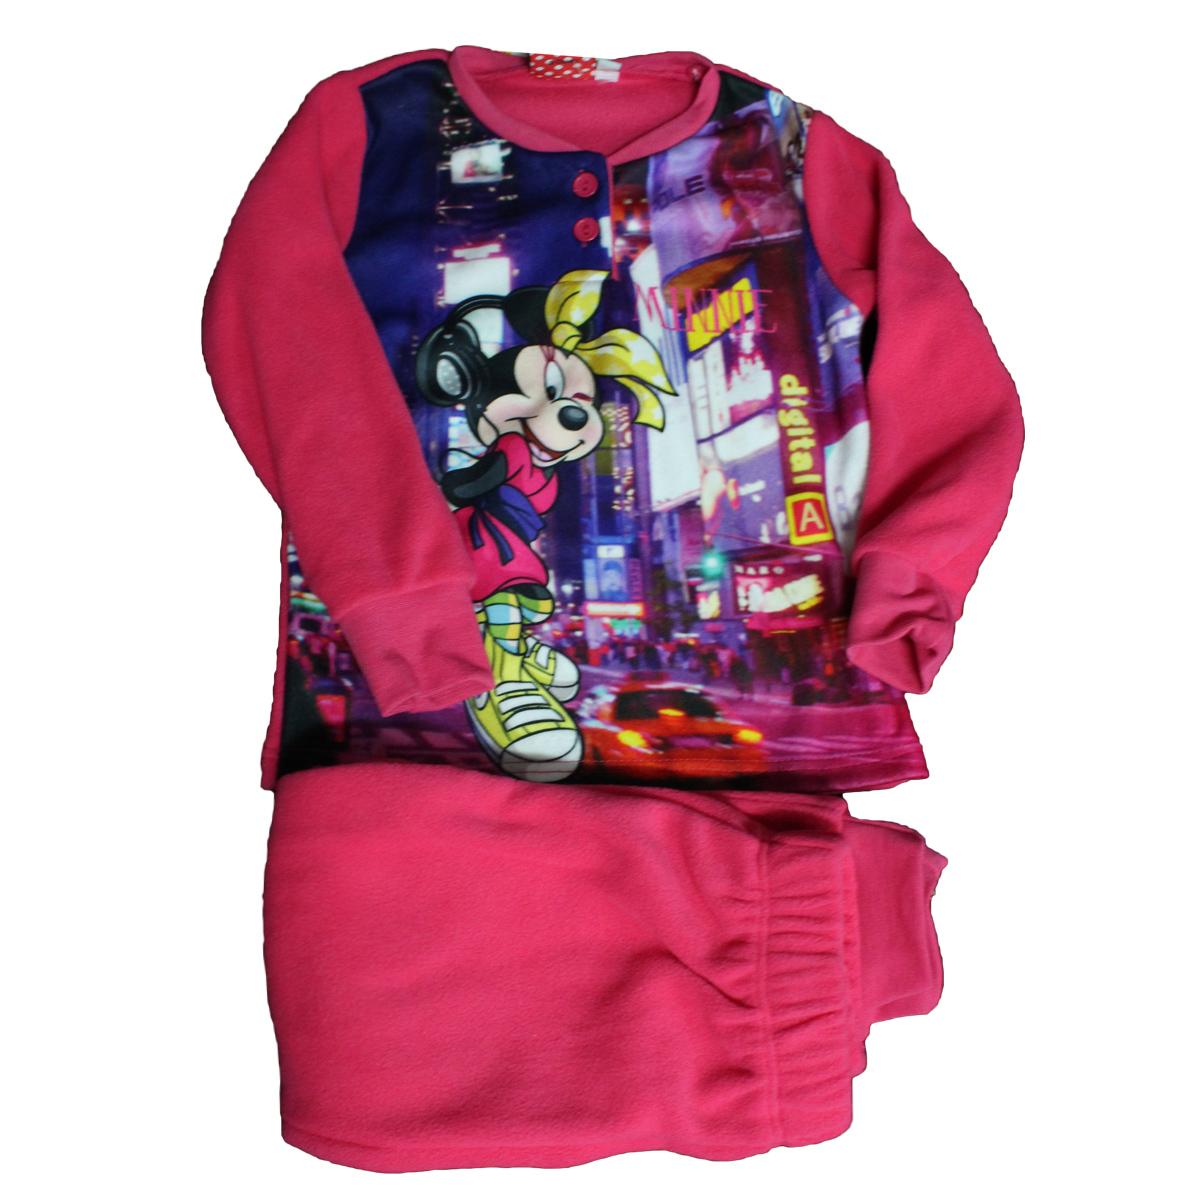 nuovo arrivo 7b01d b4207 Pigiama Bimba Tuta Bambina DISNEY Minnie Originale ROSA FUXIA PILE ...